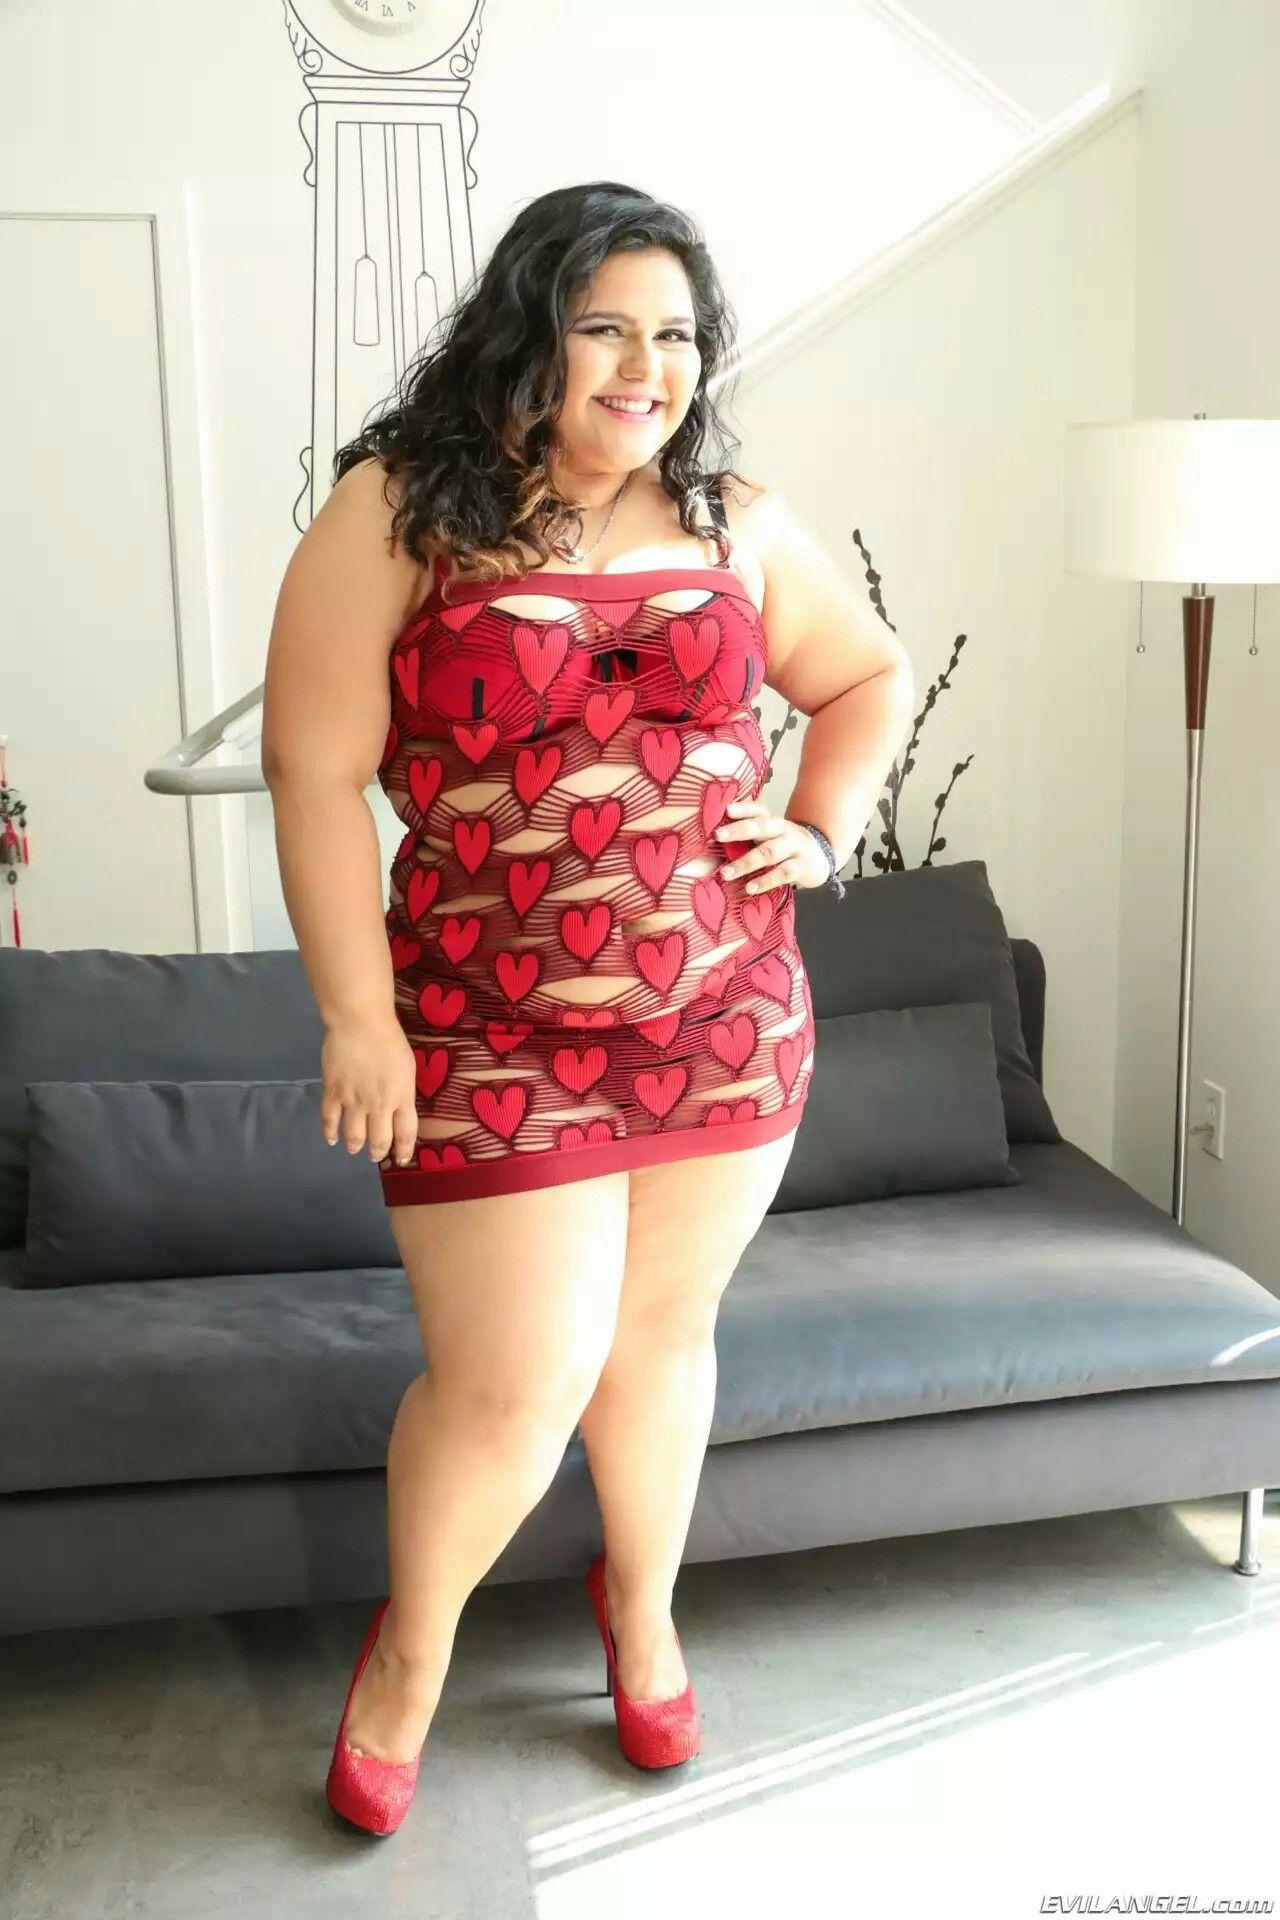 pinfranco on curvy/ chubby/bbw/etc | pinterest | latina, curvy